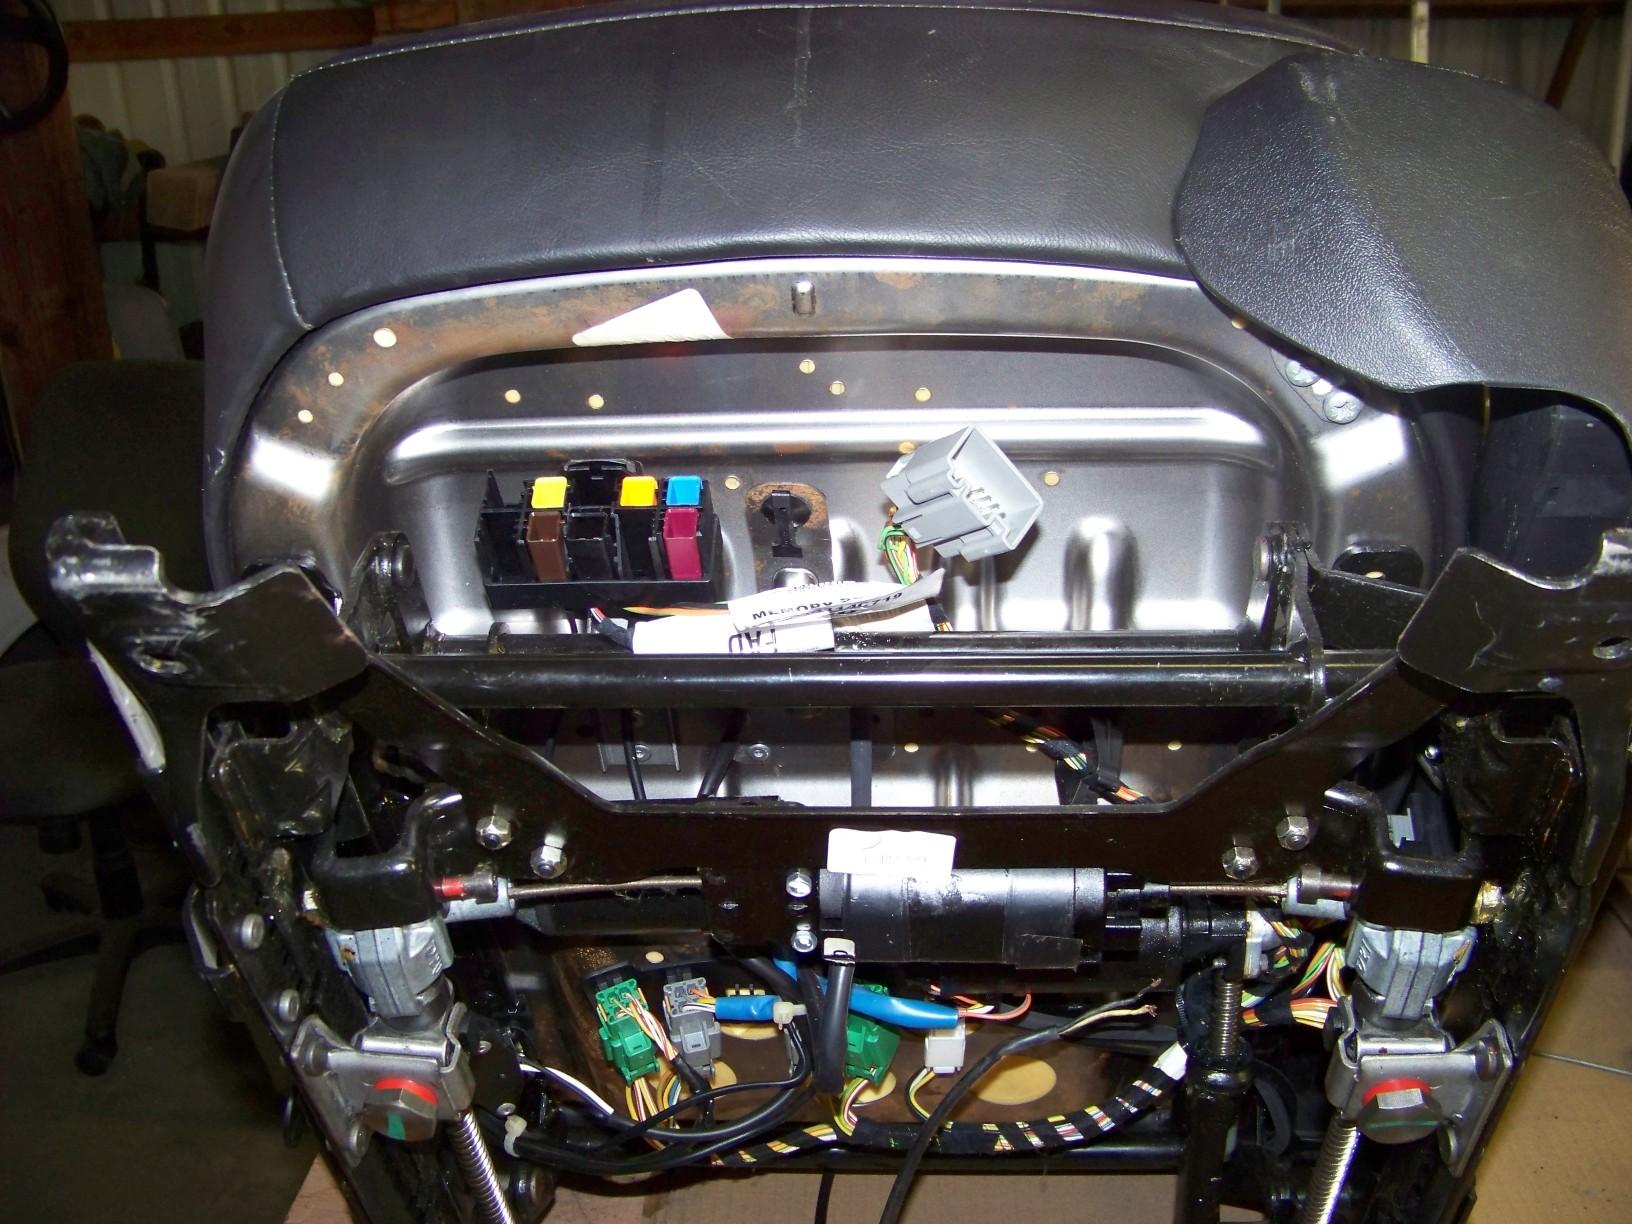 hight resolution of power seat wiring to make it work outside the car jaguar forums jaguar seat diagram